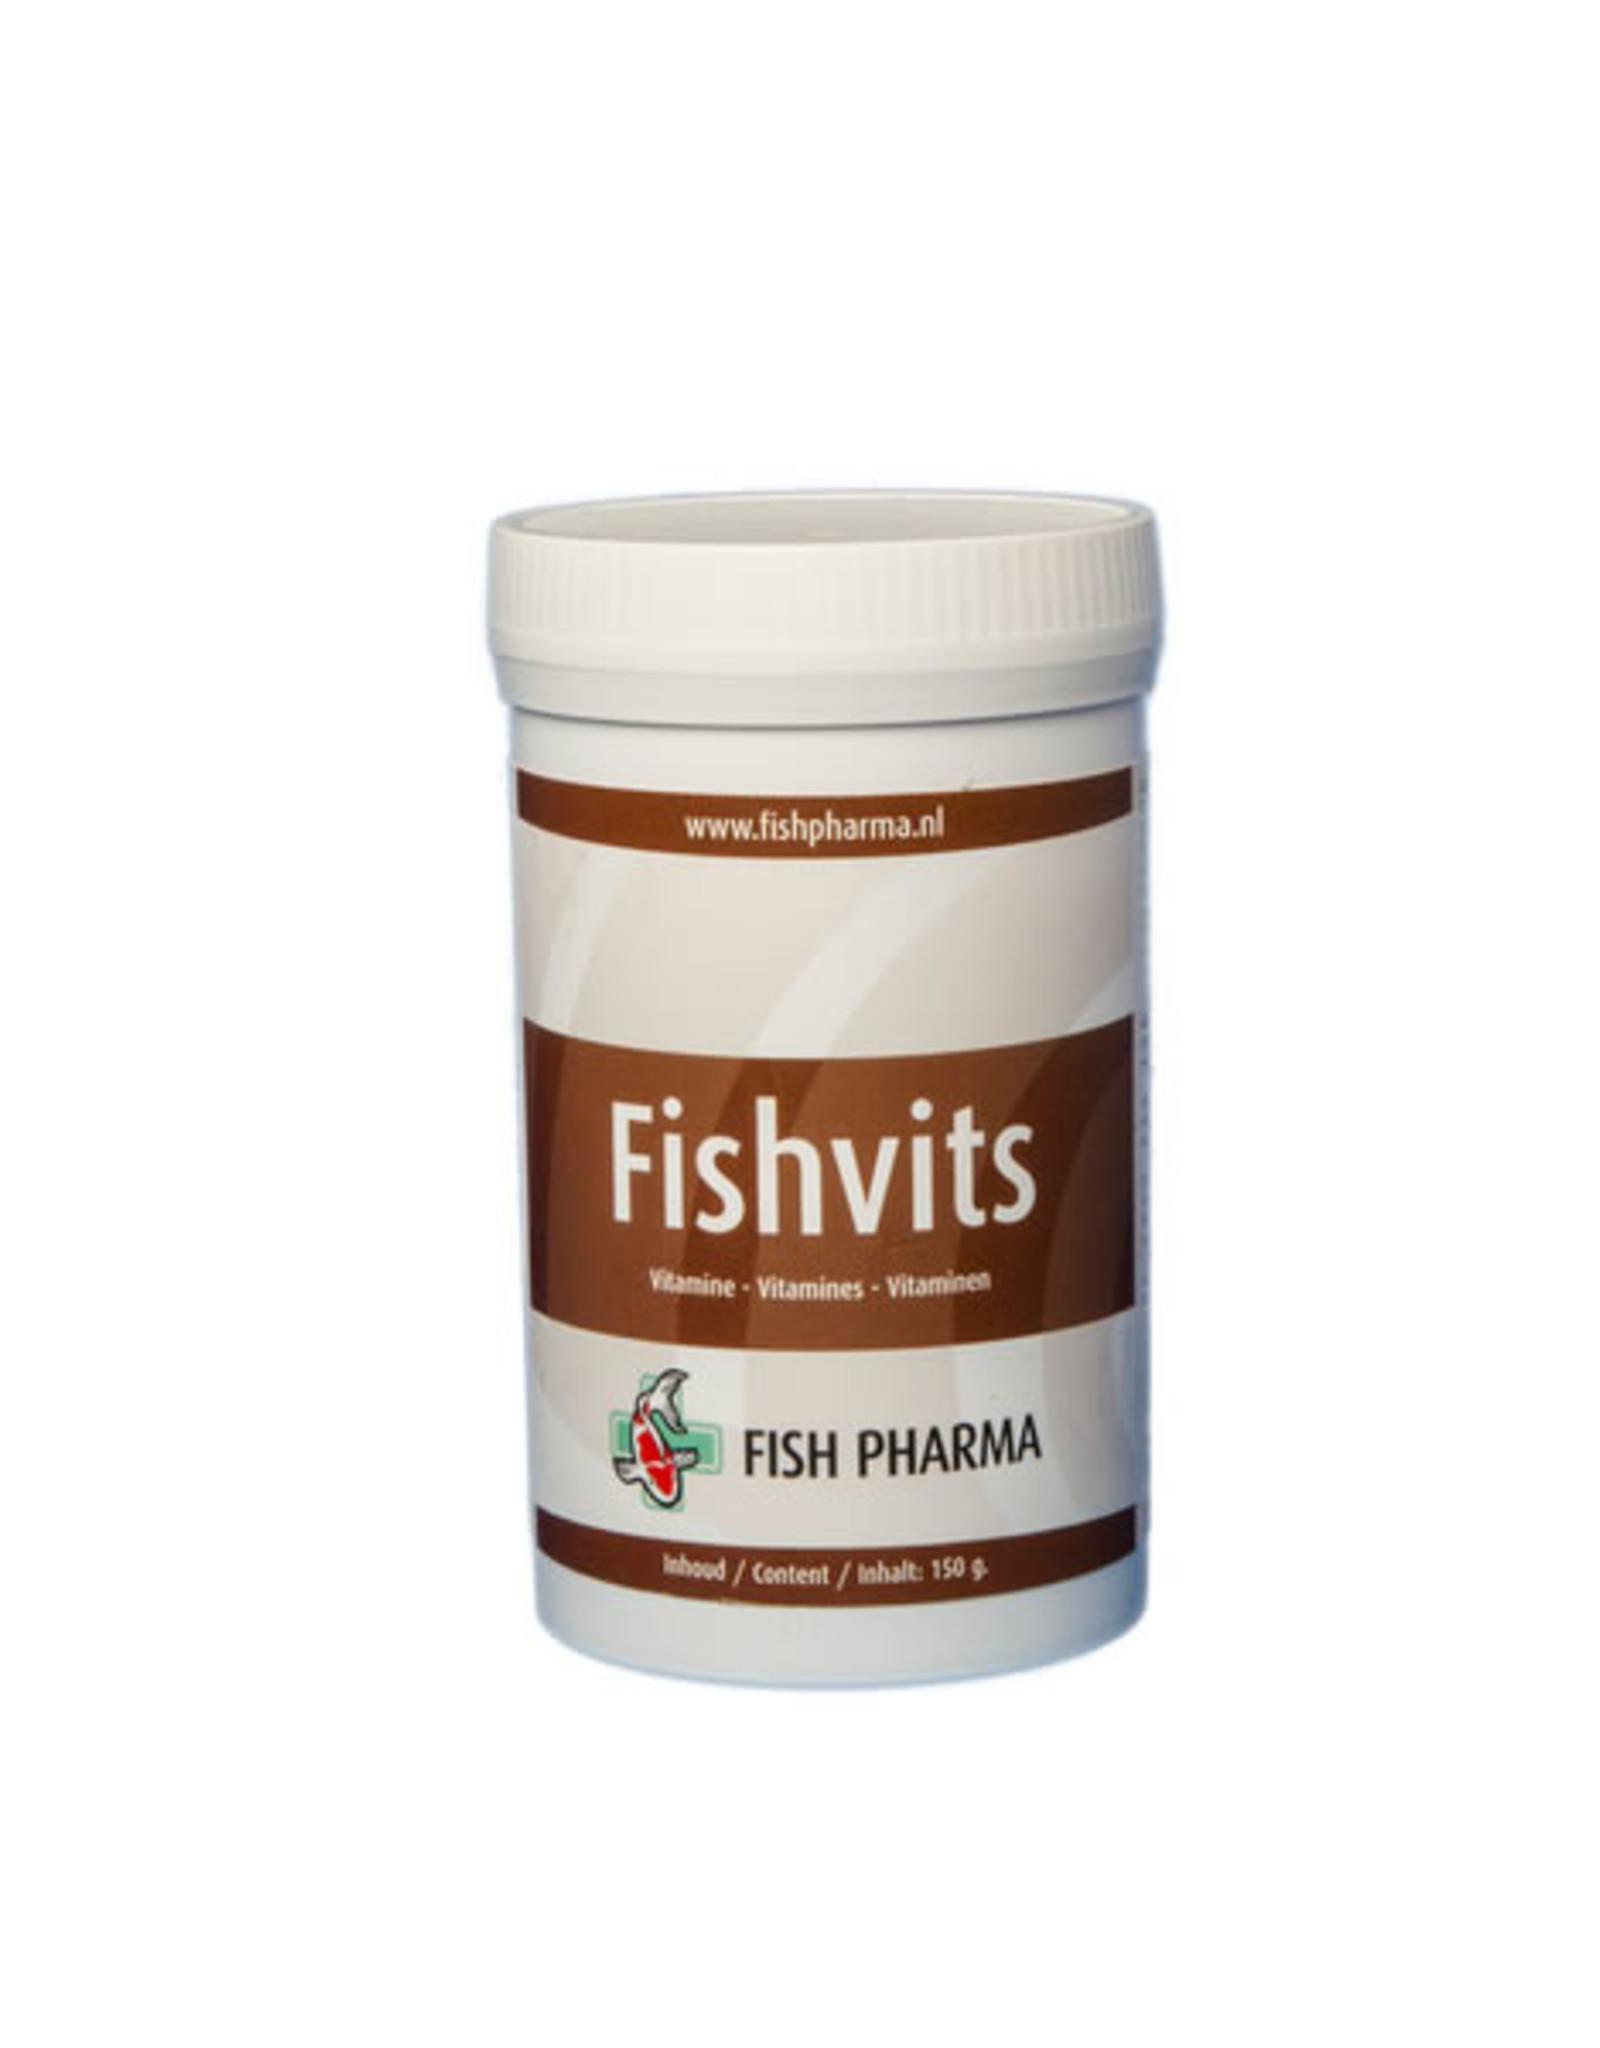 Fish Pharma Fishvits vitaminen voor vissen.